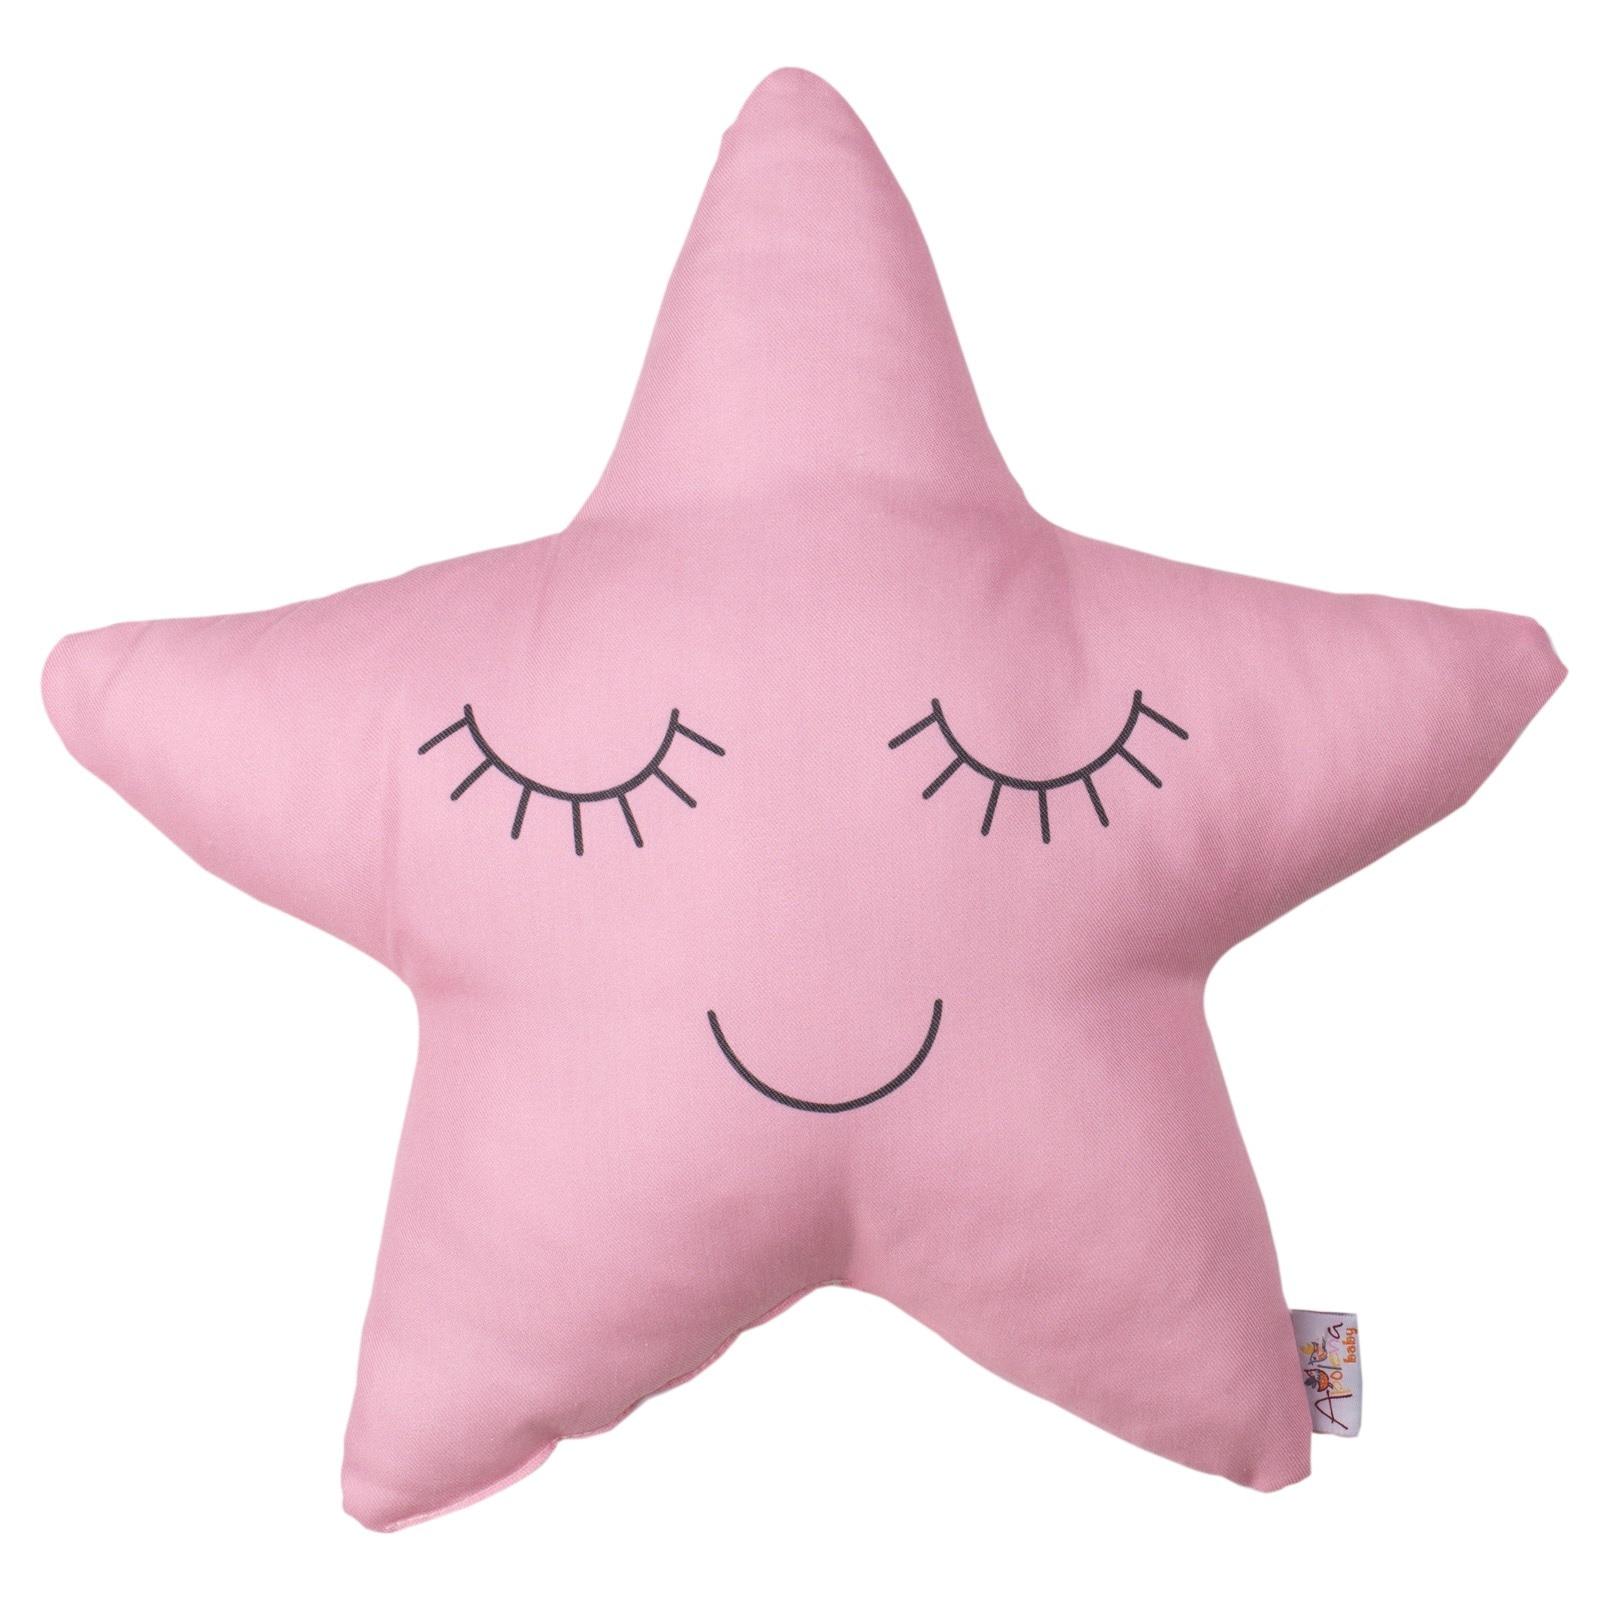 Ebebek Apolena Baby Pillow 38x38x10 Cm